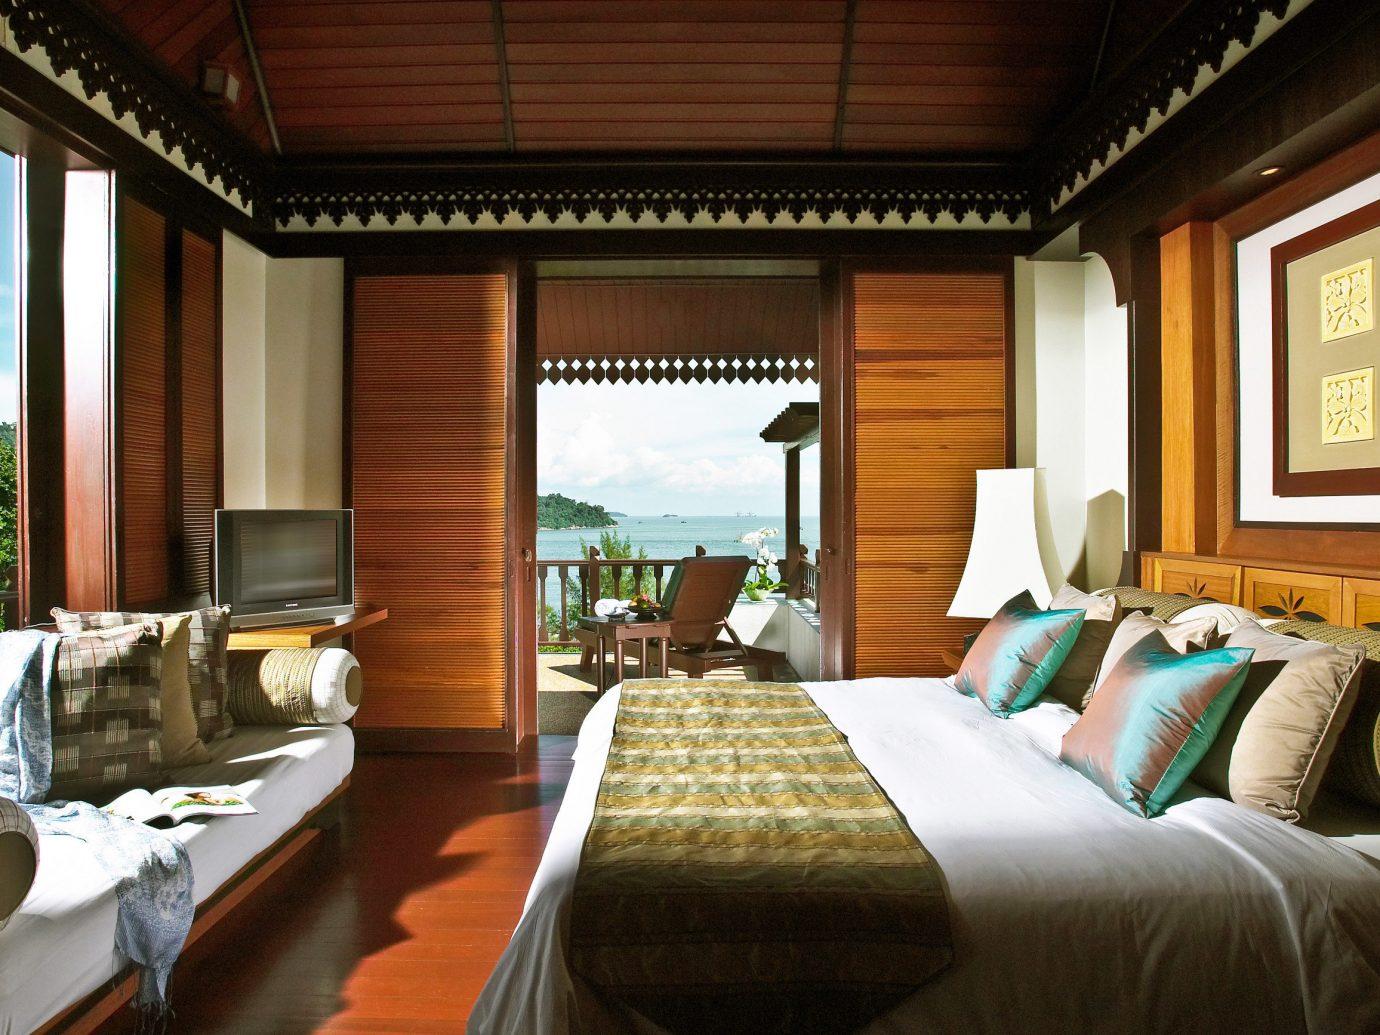 Bedroom at Pangkor Laut Resort, Pangkor, Malaysia